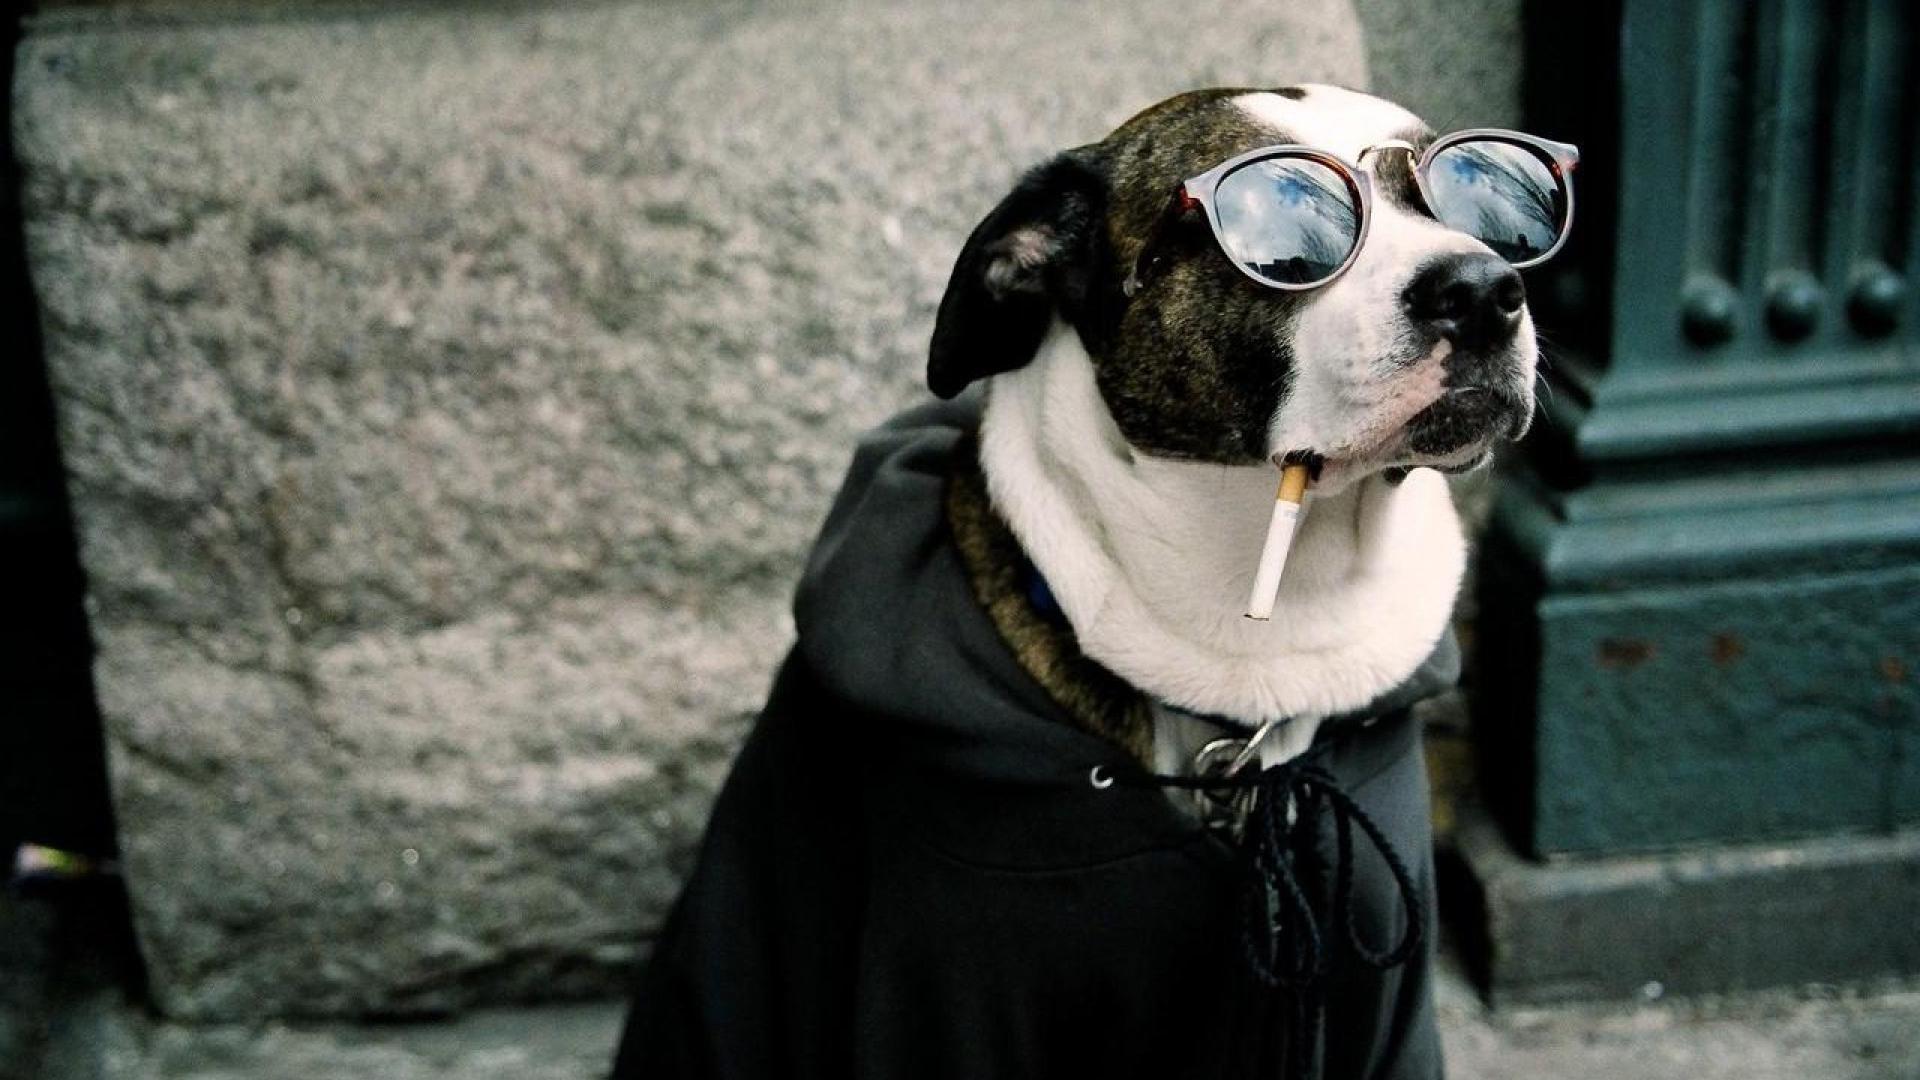 Dog Funny HD Wallpapers Download Desktop Wallpaper Images 1920x1080